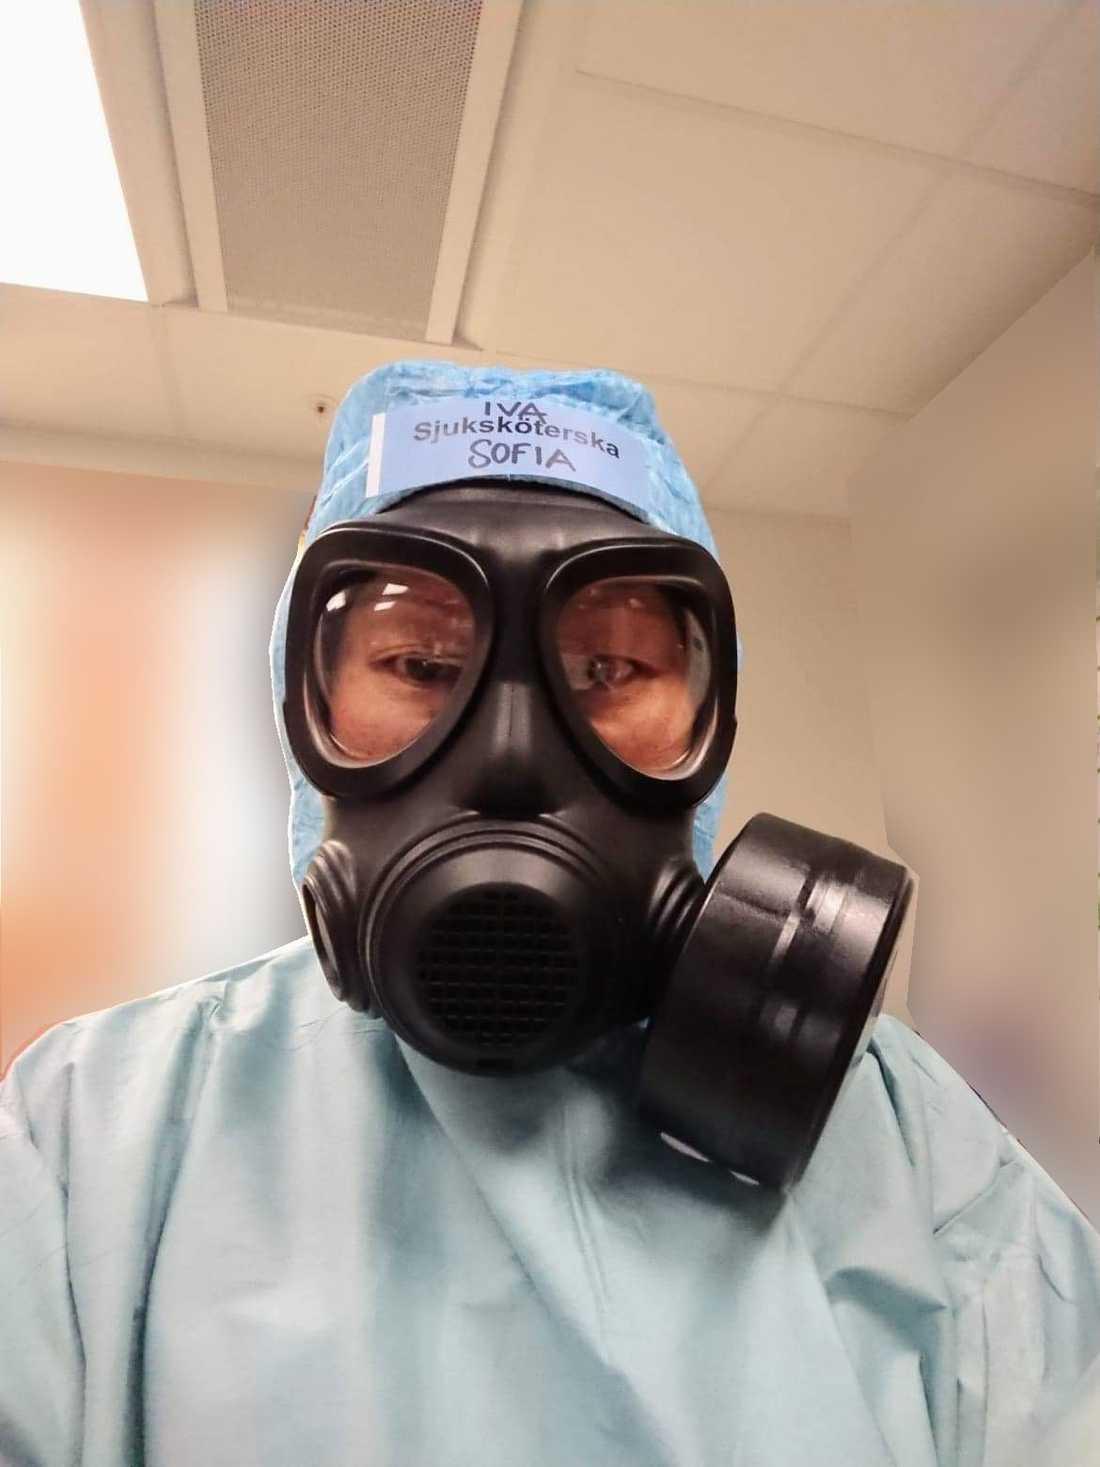 Sjuksköterskan Sofia Cervin